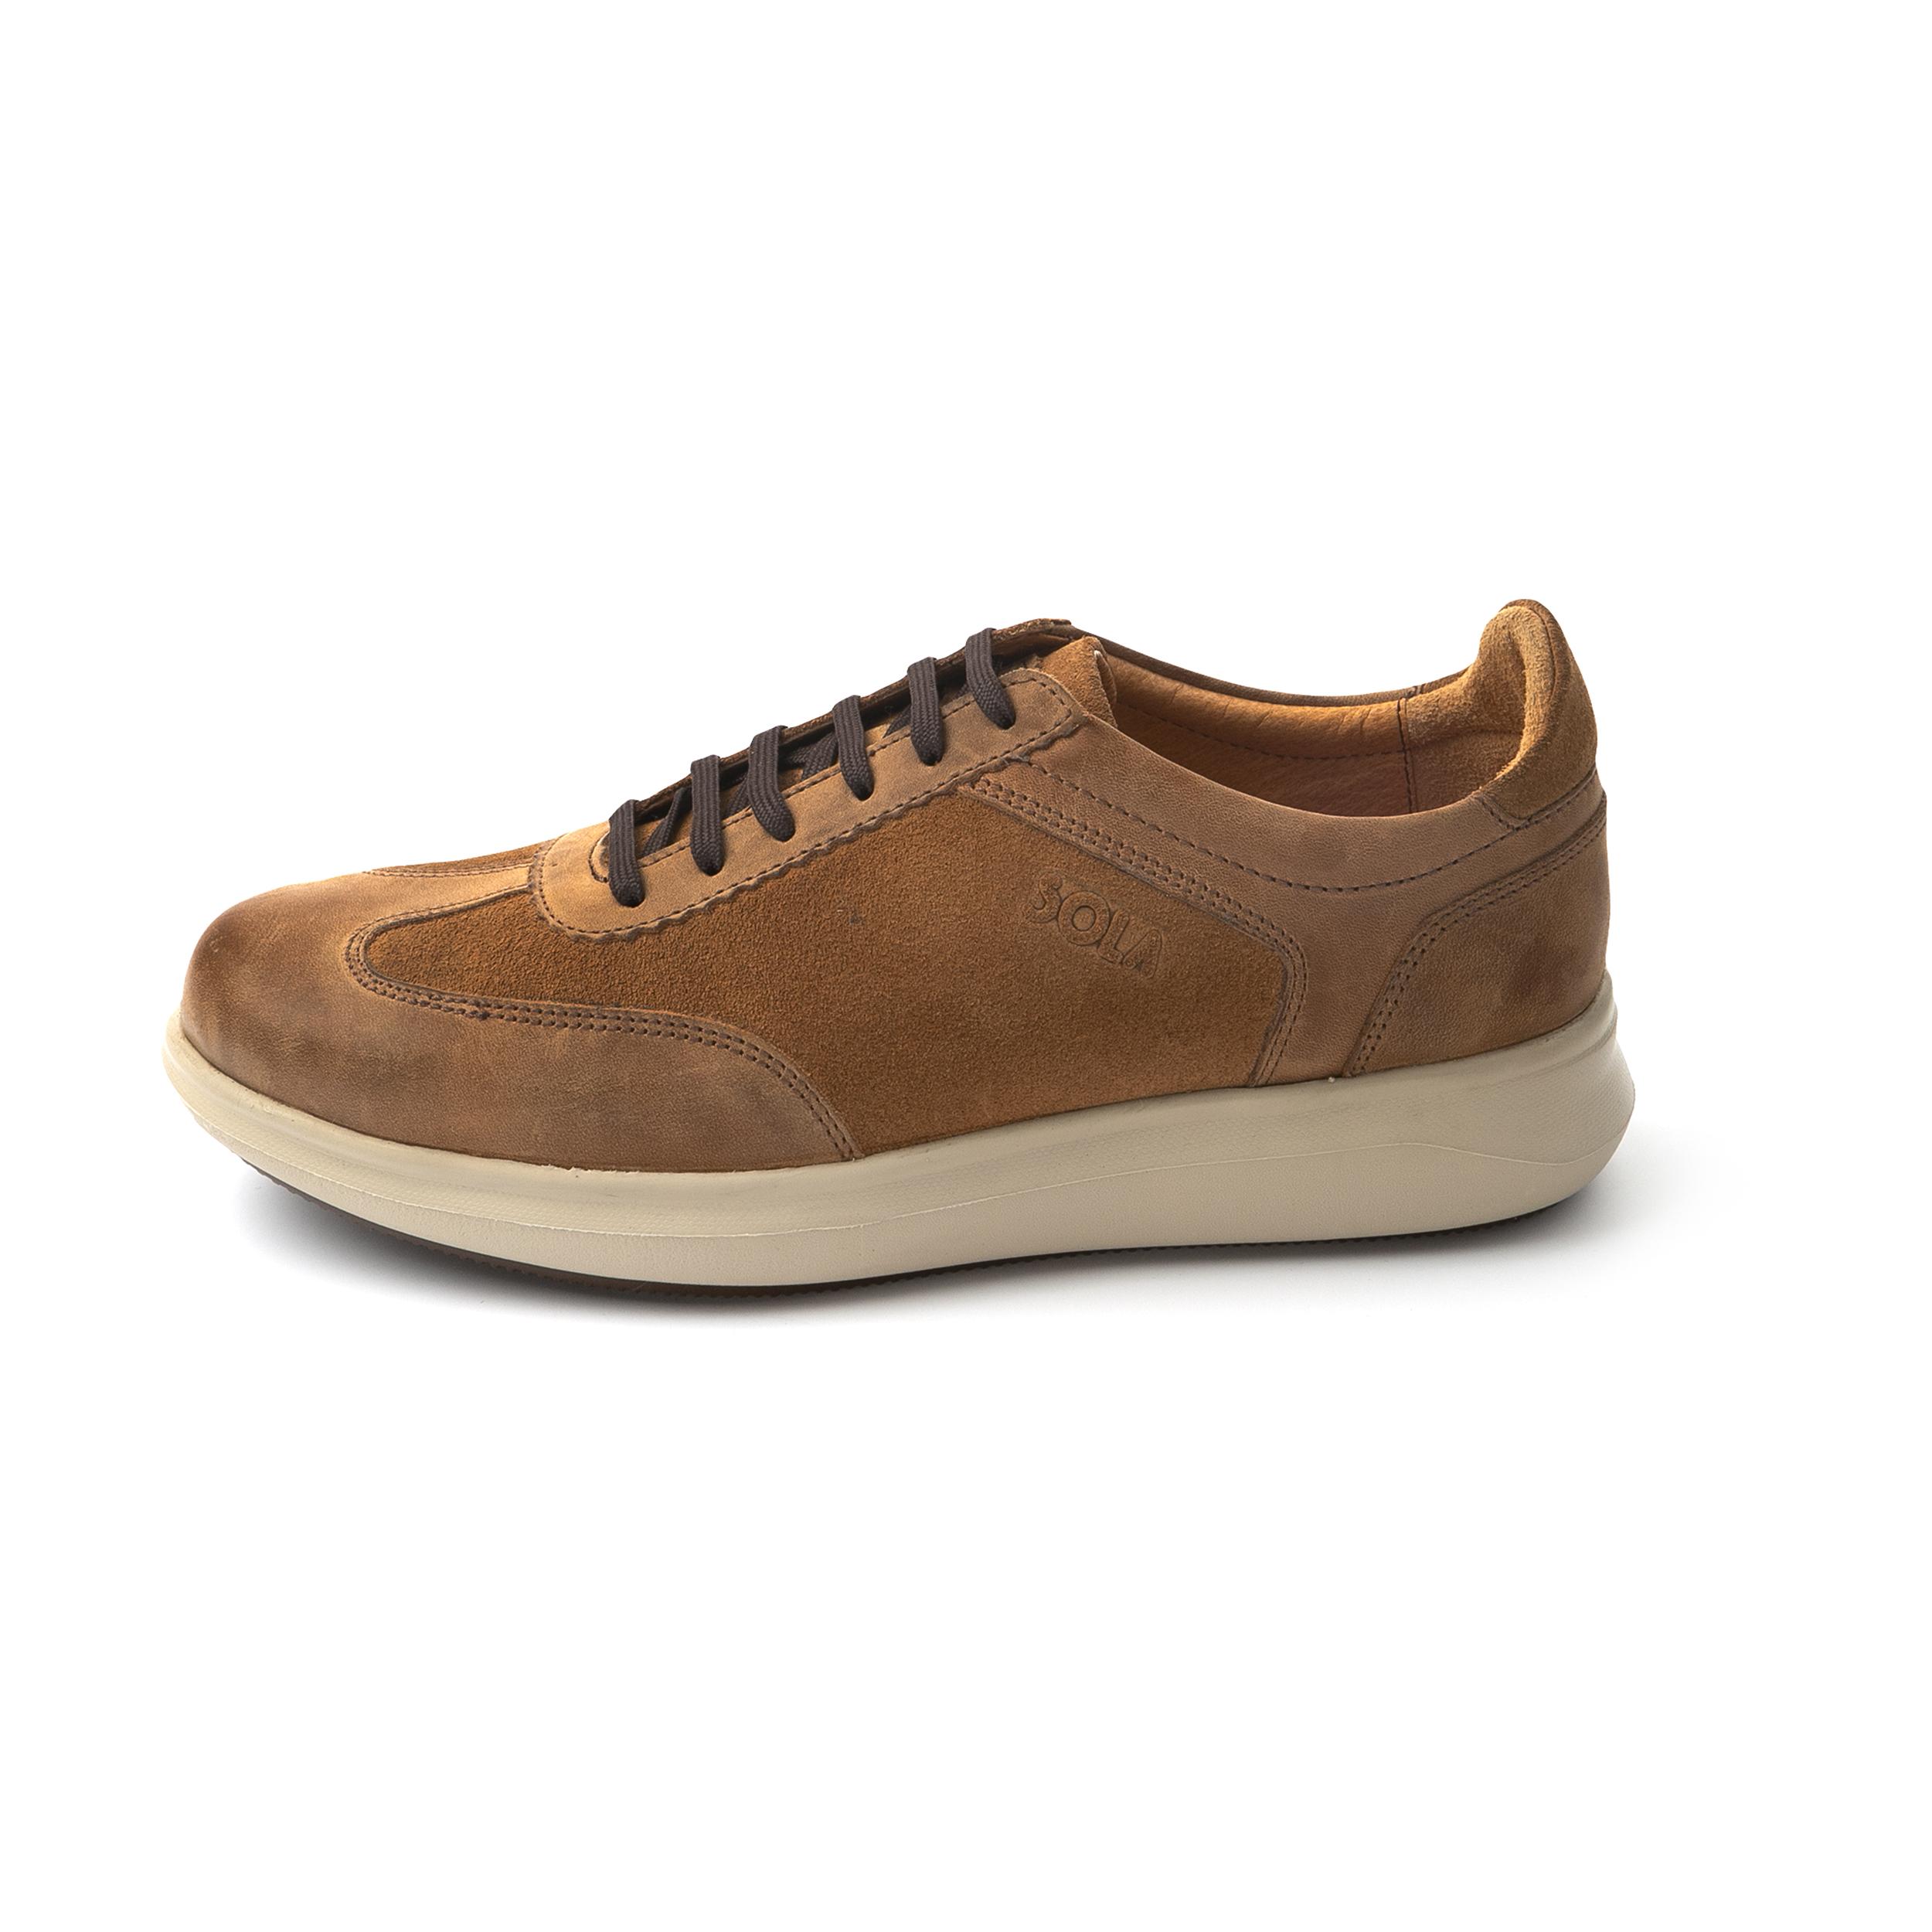 کفش روزمره مردانه سولا مدل SM729600036Brown